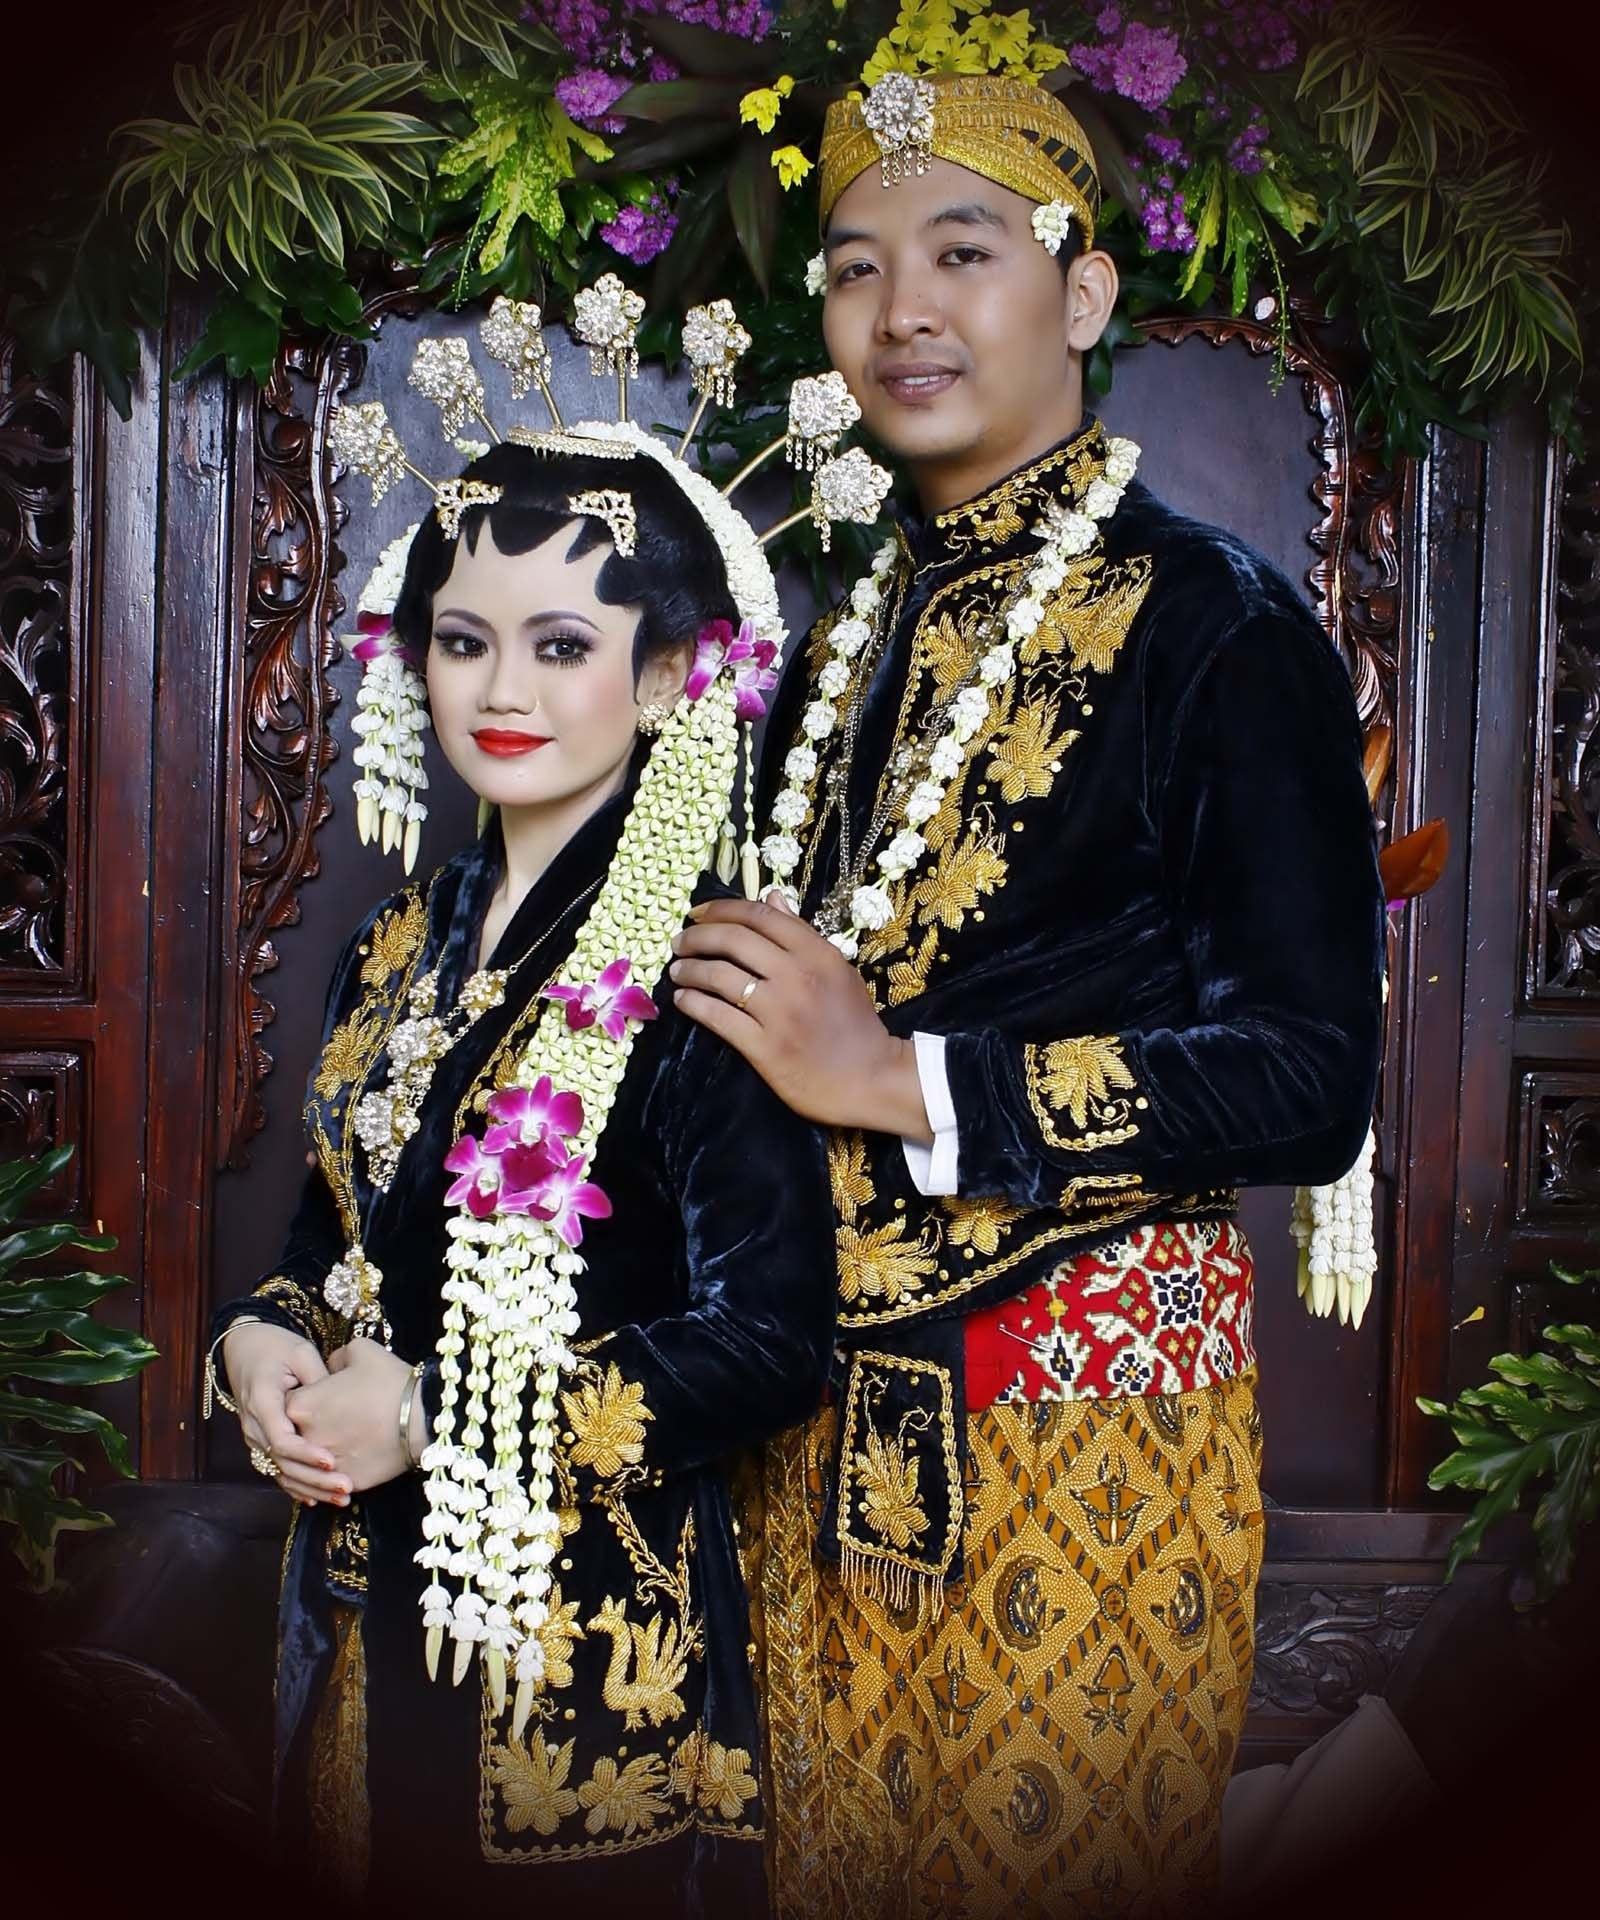 Ide Baju Pengantin Muslimah Jawa Syar'i Jxdu Model Baju Pengantin Tradisional Jawa Timur 853x1024 Model